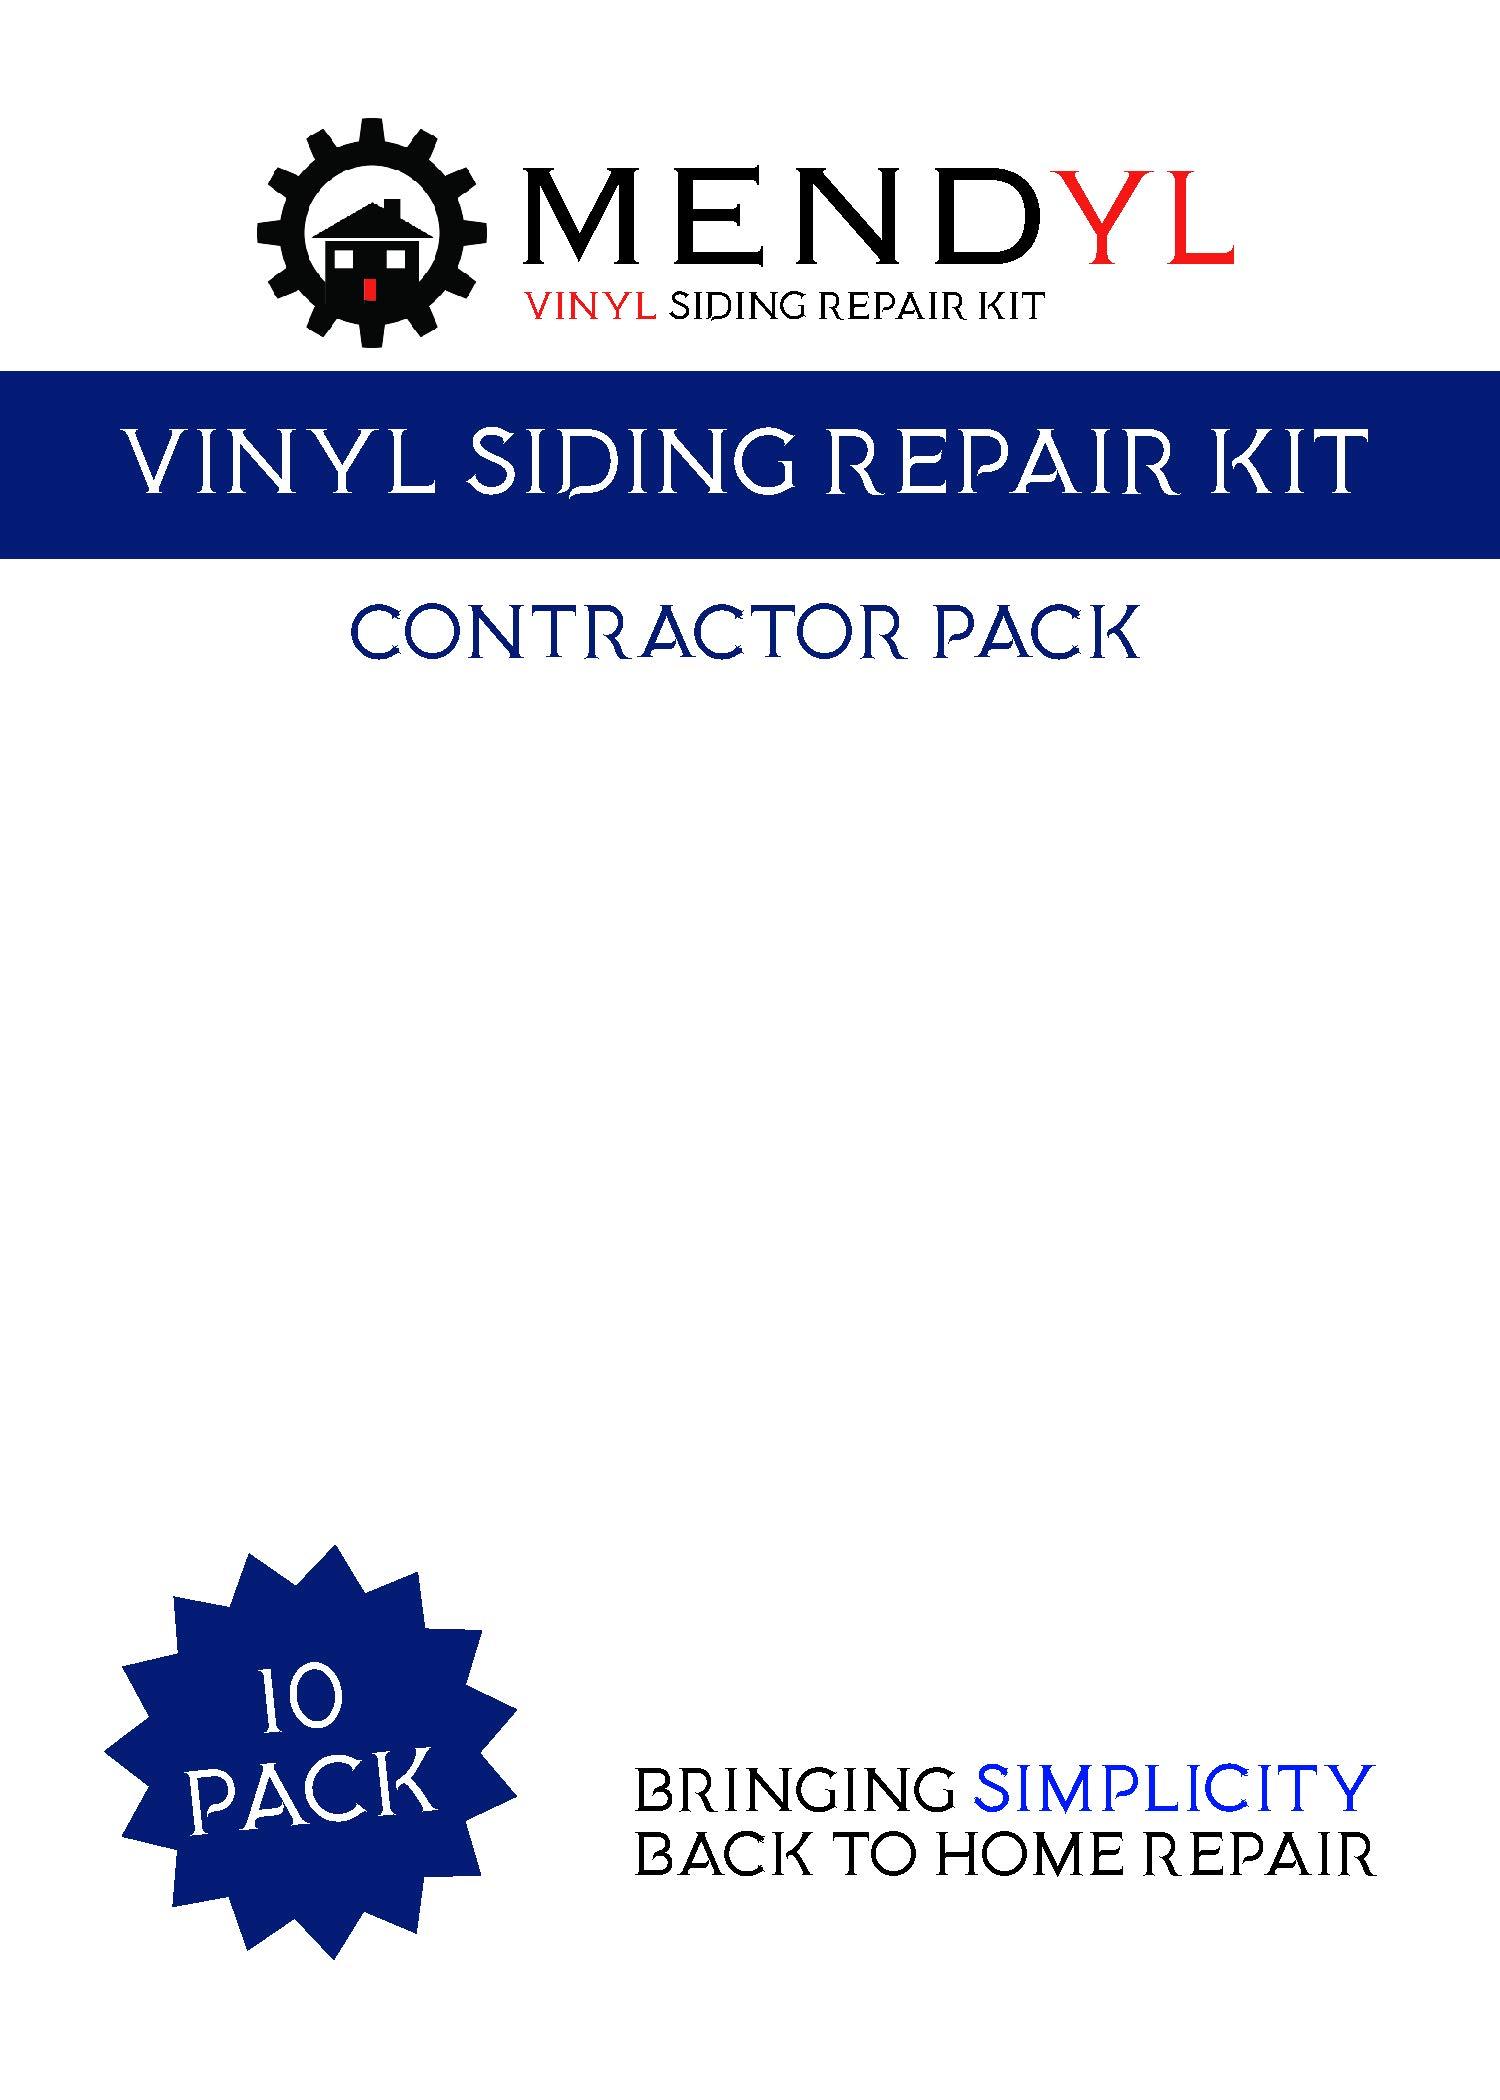 Mendyl Vinyl Siding Repair Kit Cover Any Cracks Holes